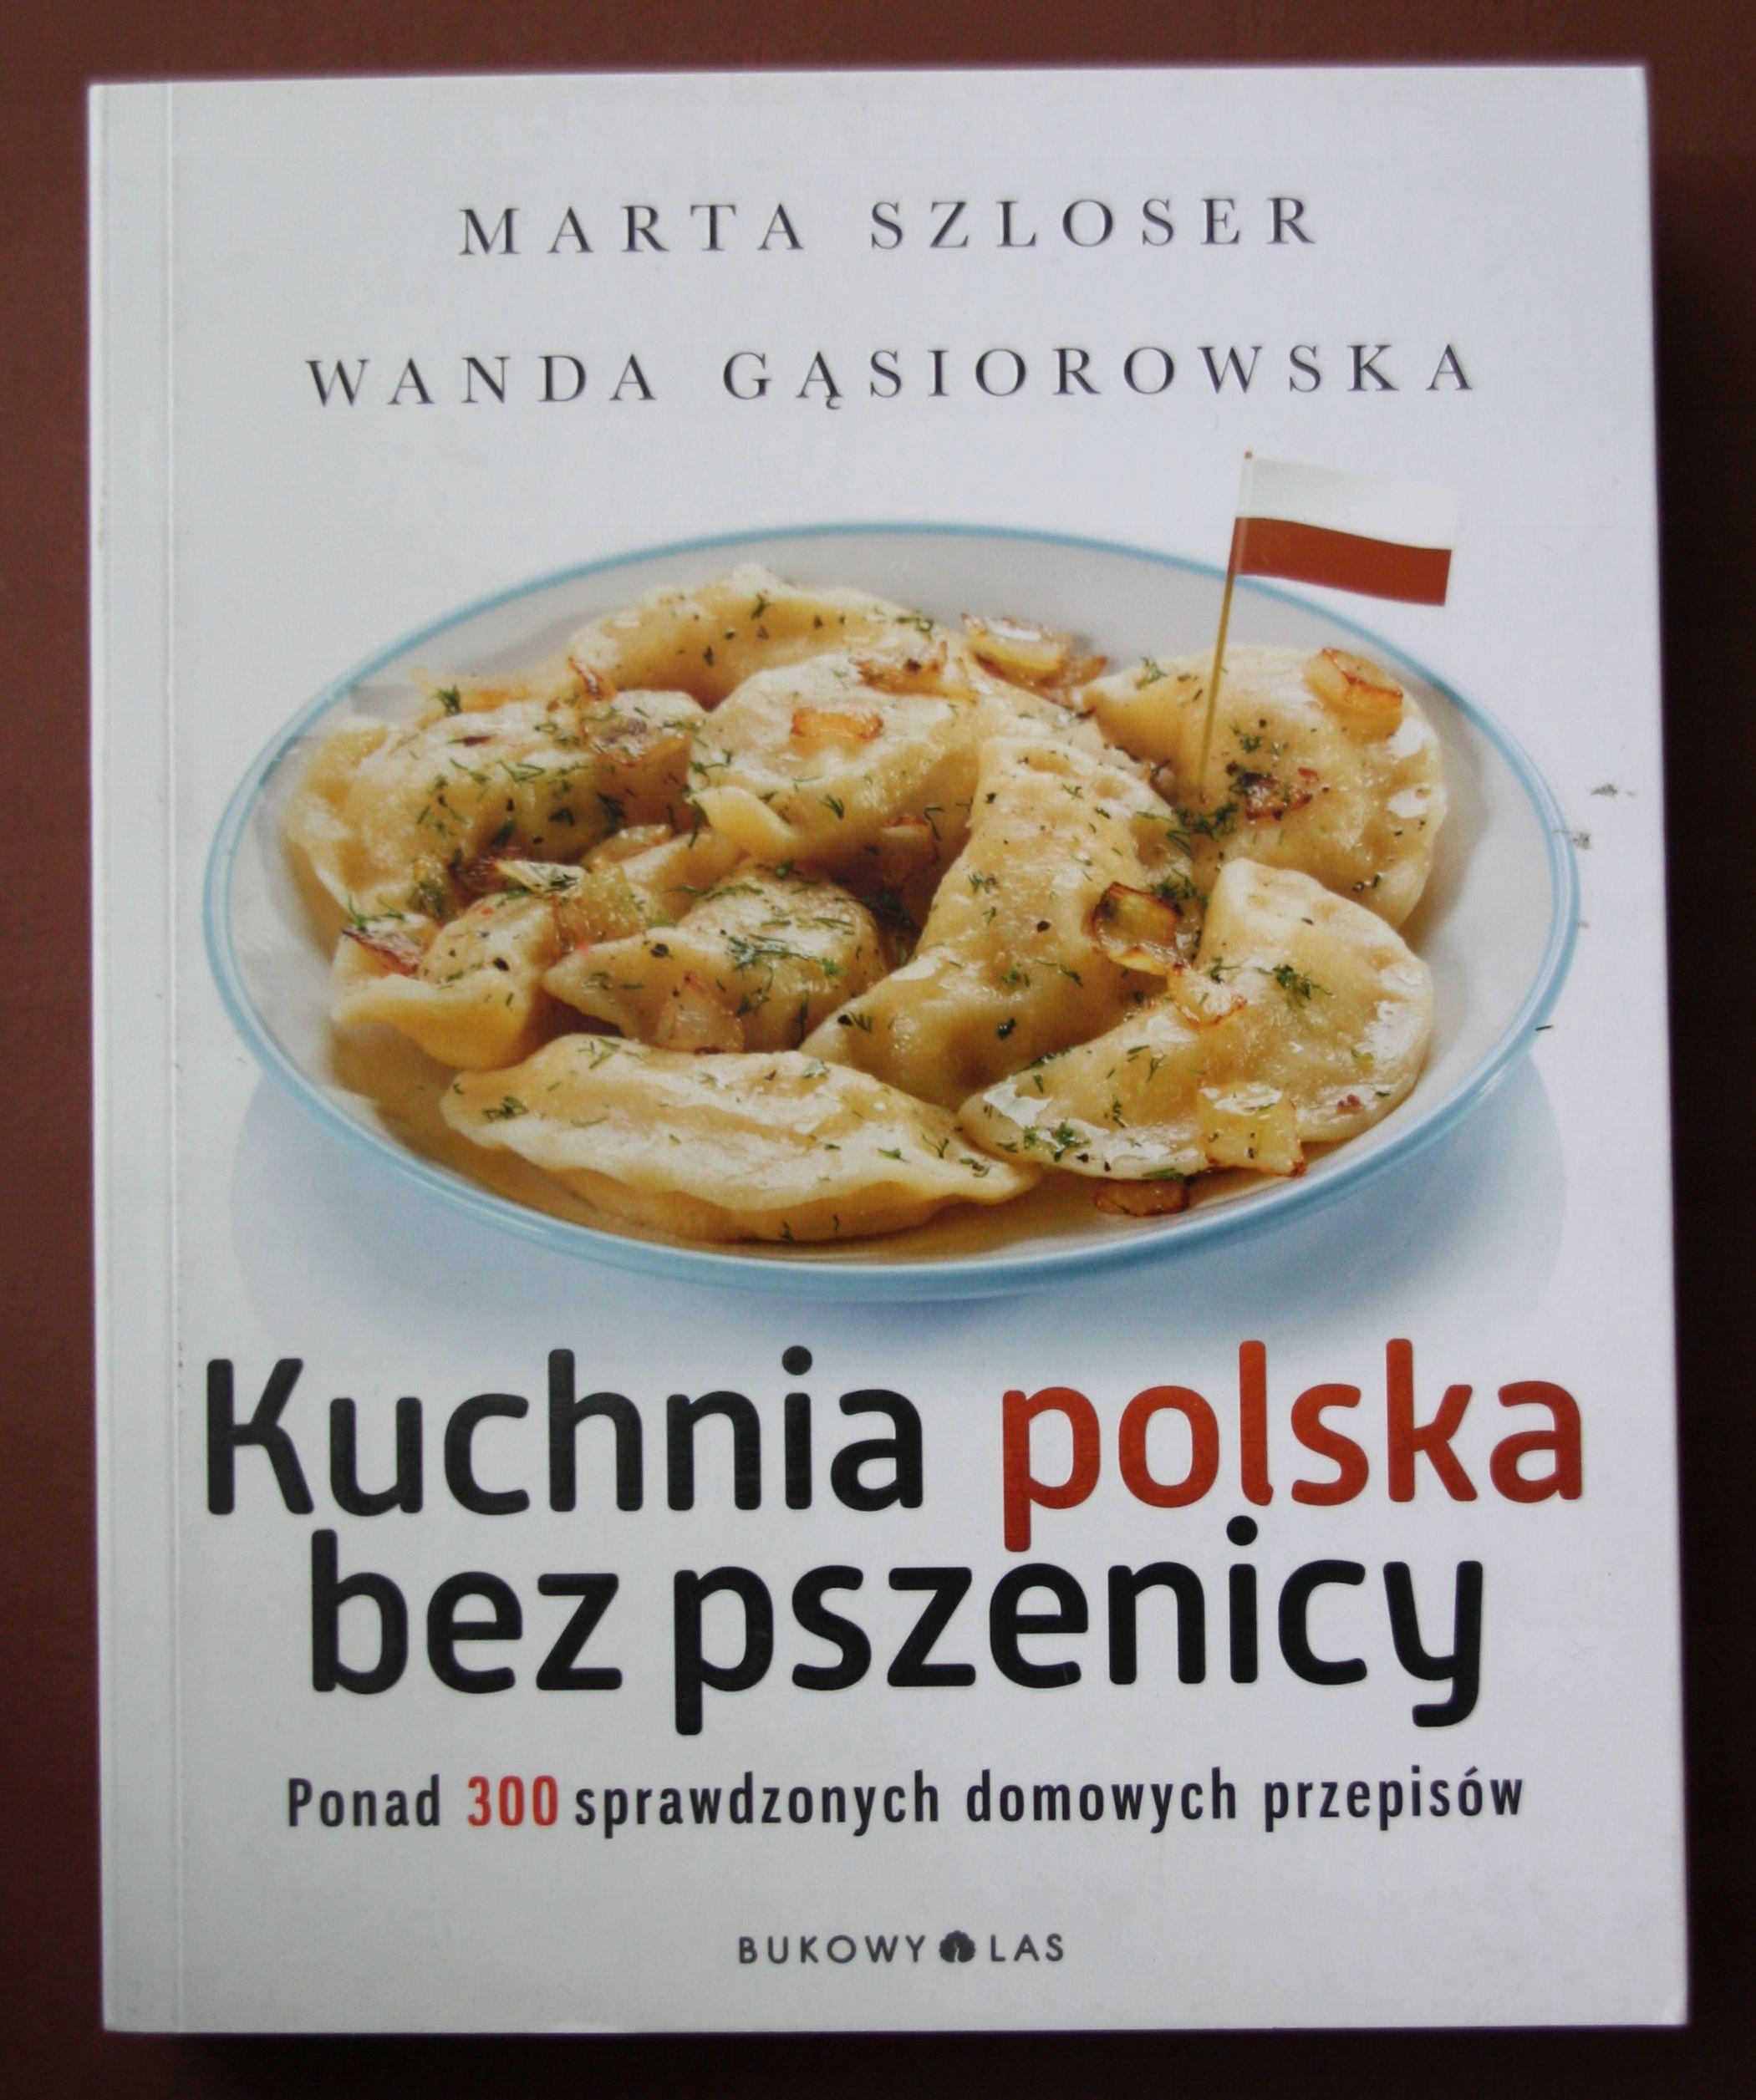 Kuchnia Polska Bez Pszenicy Gąsiorowska Szloser